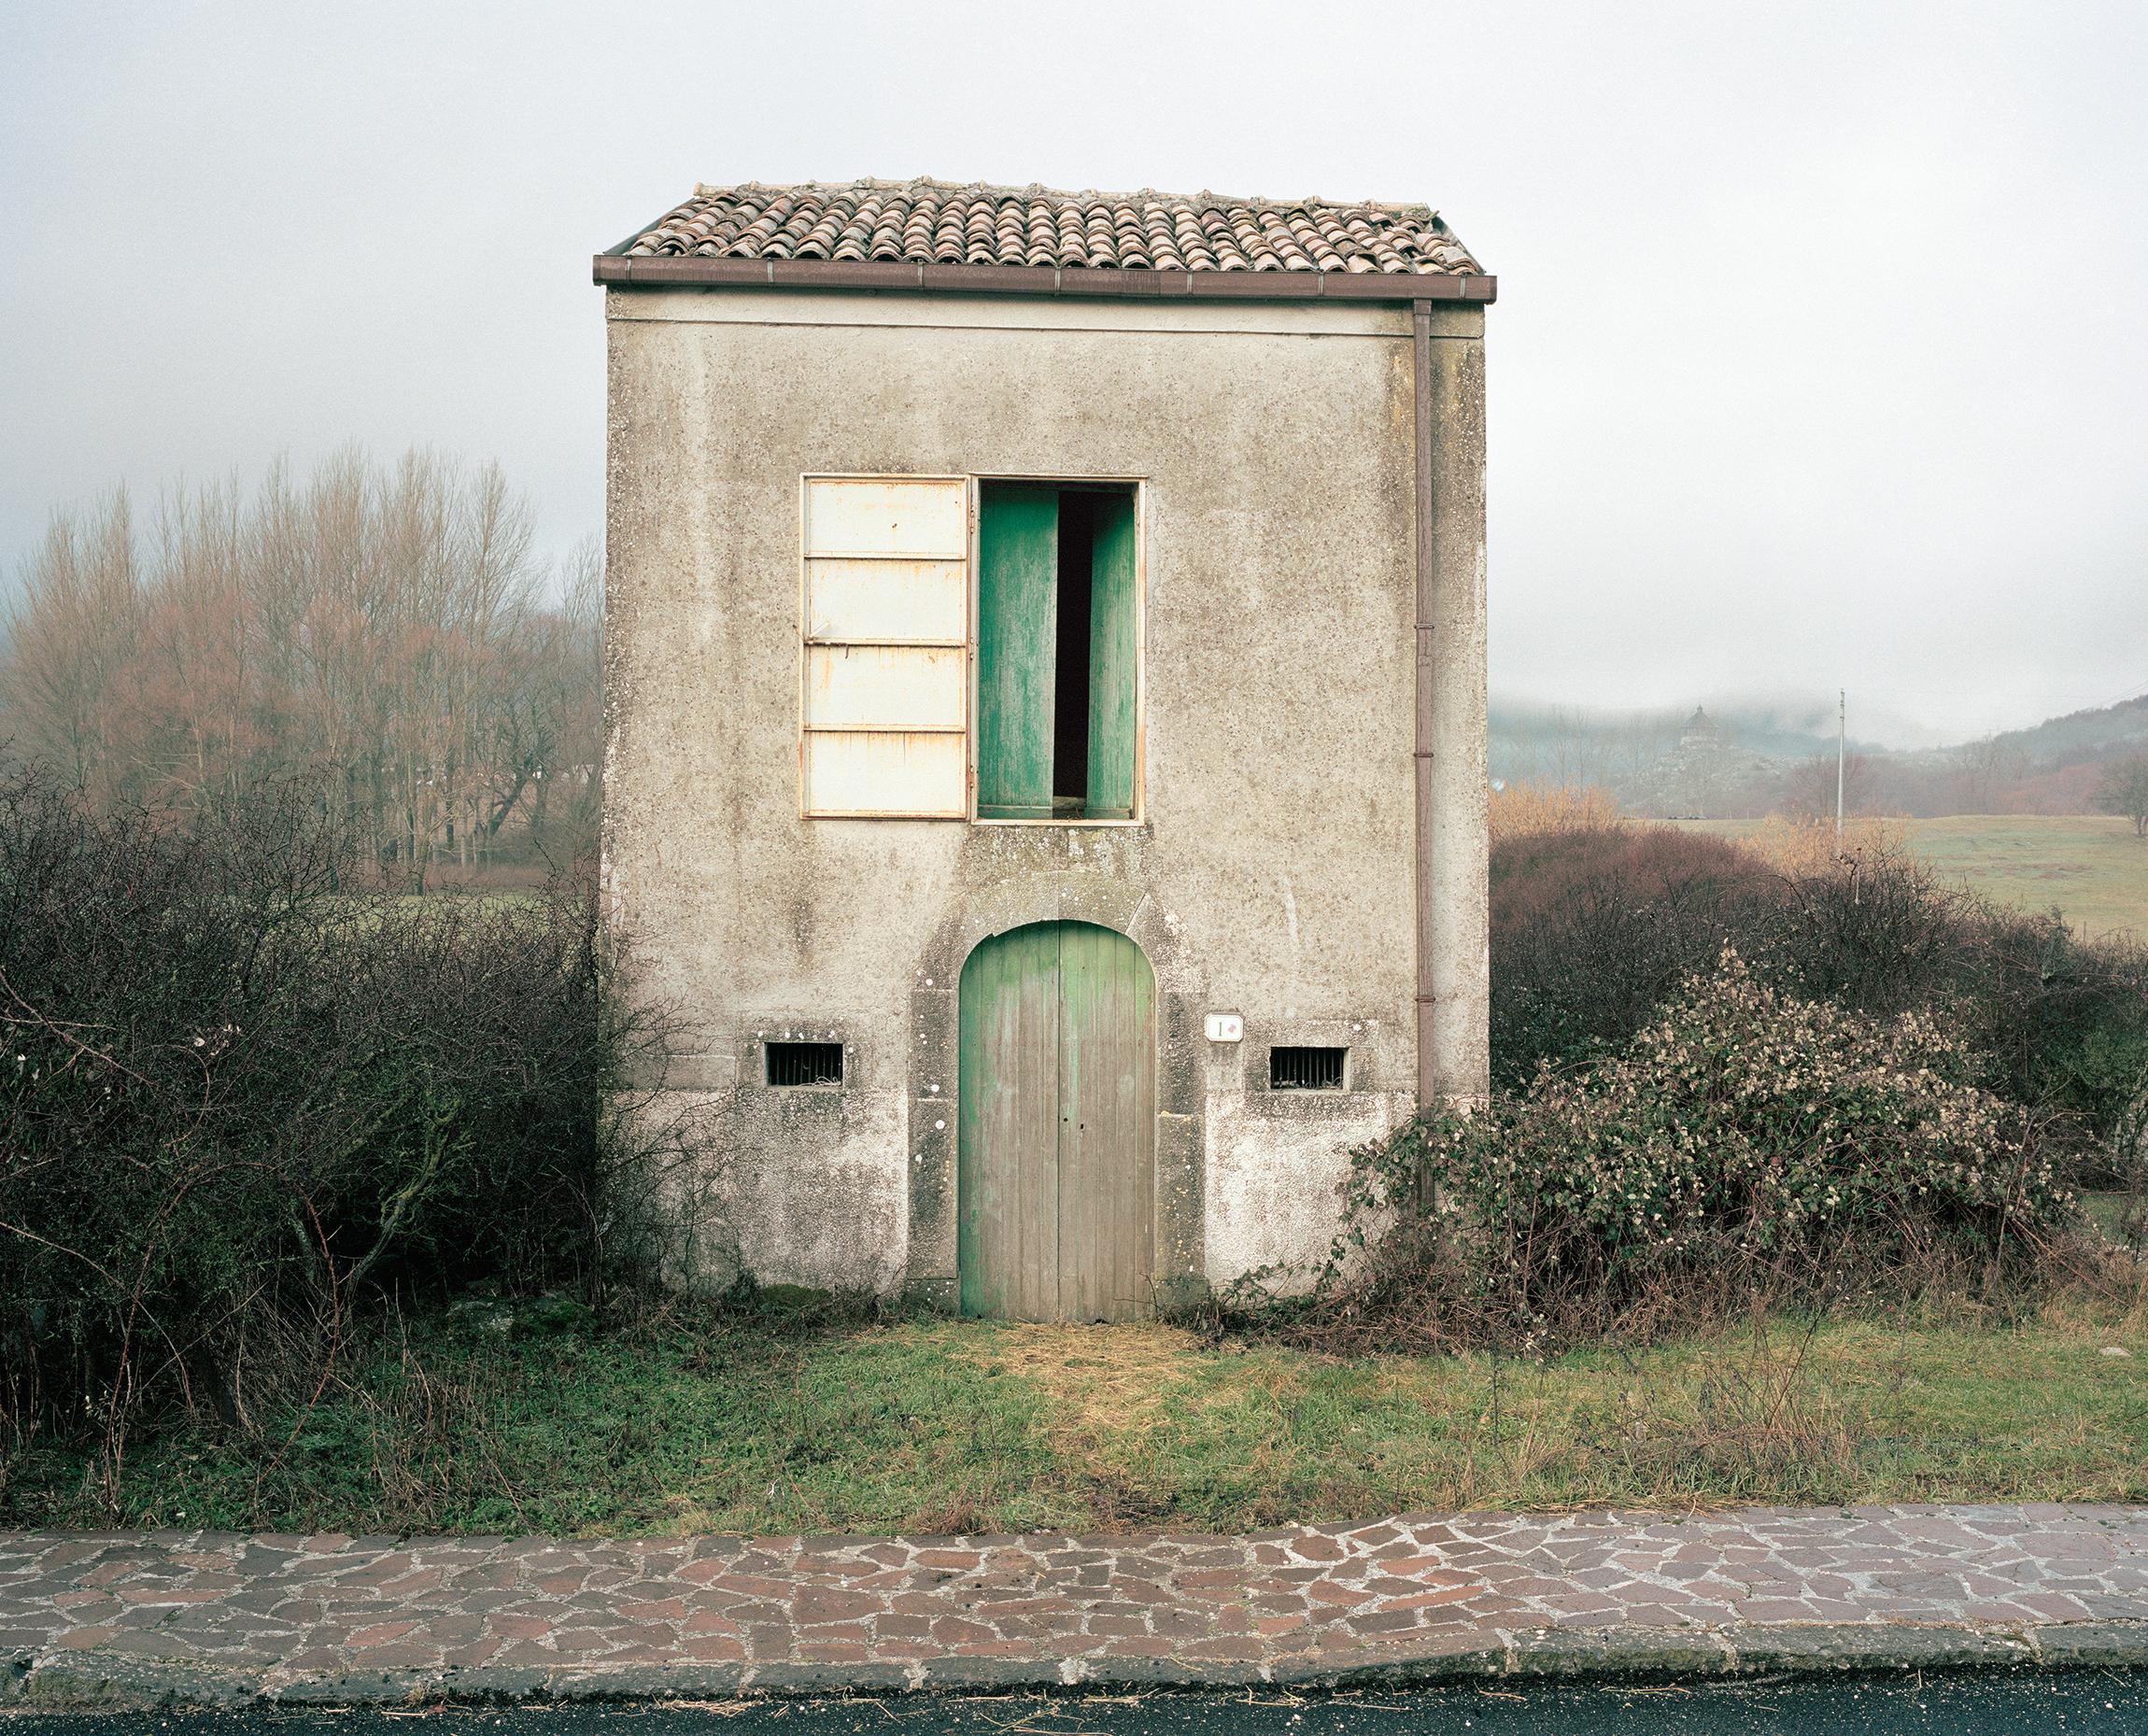 Images ©  VINCENZO PAGLIUCA